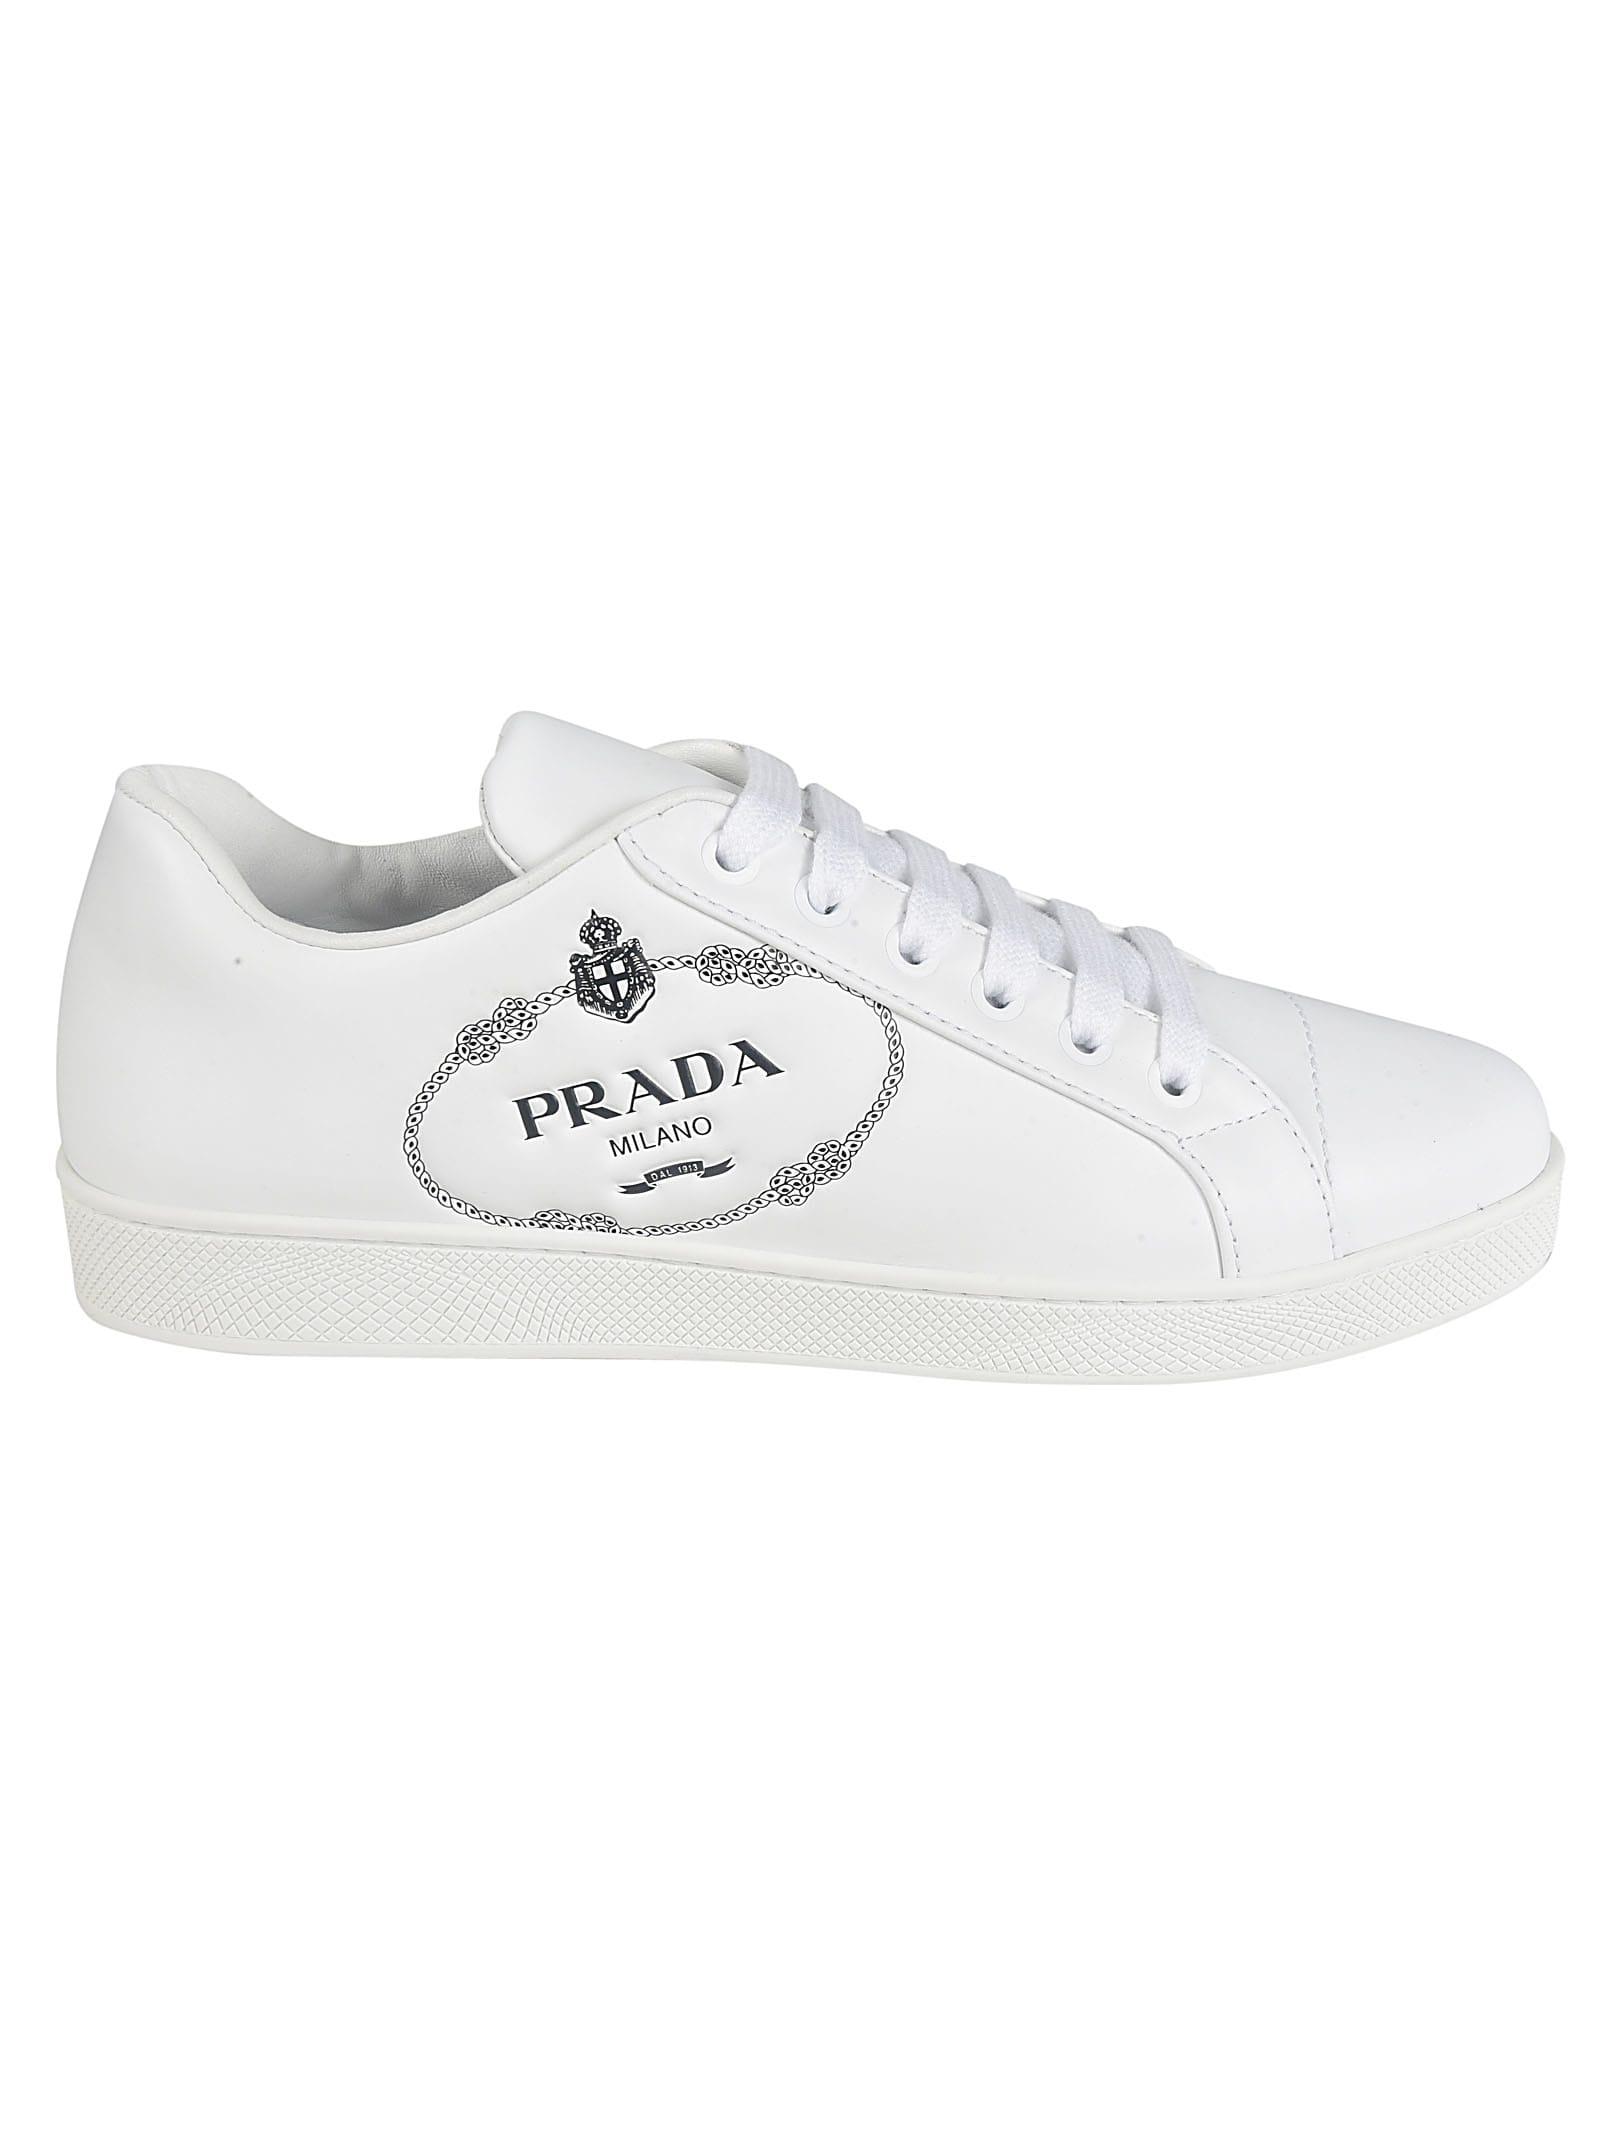 Buy Prada Logo Sneakers online, shop Prada shoes with free shipping